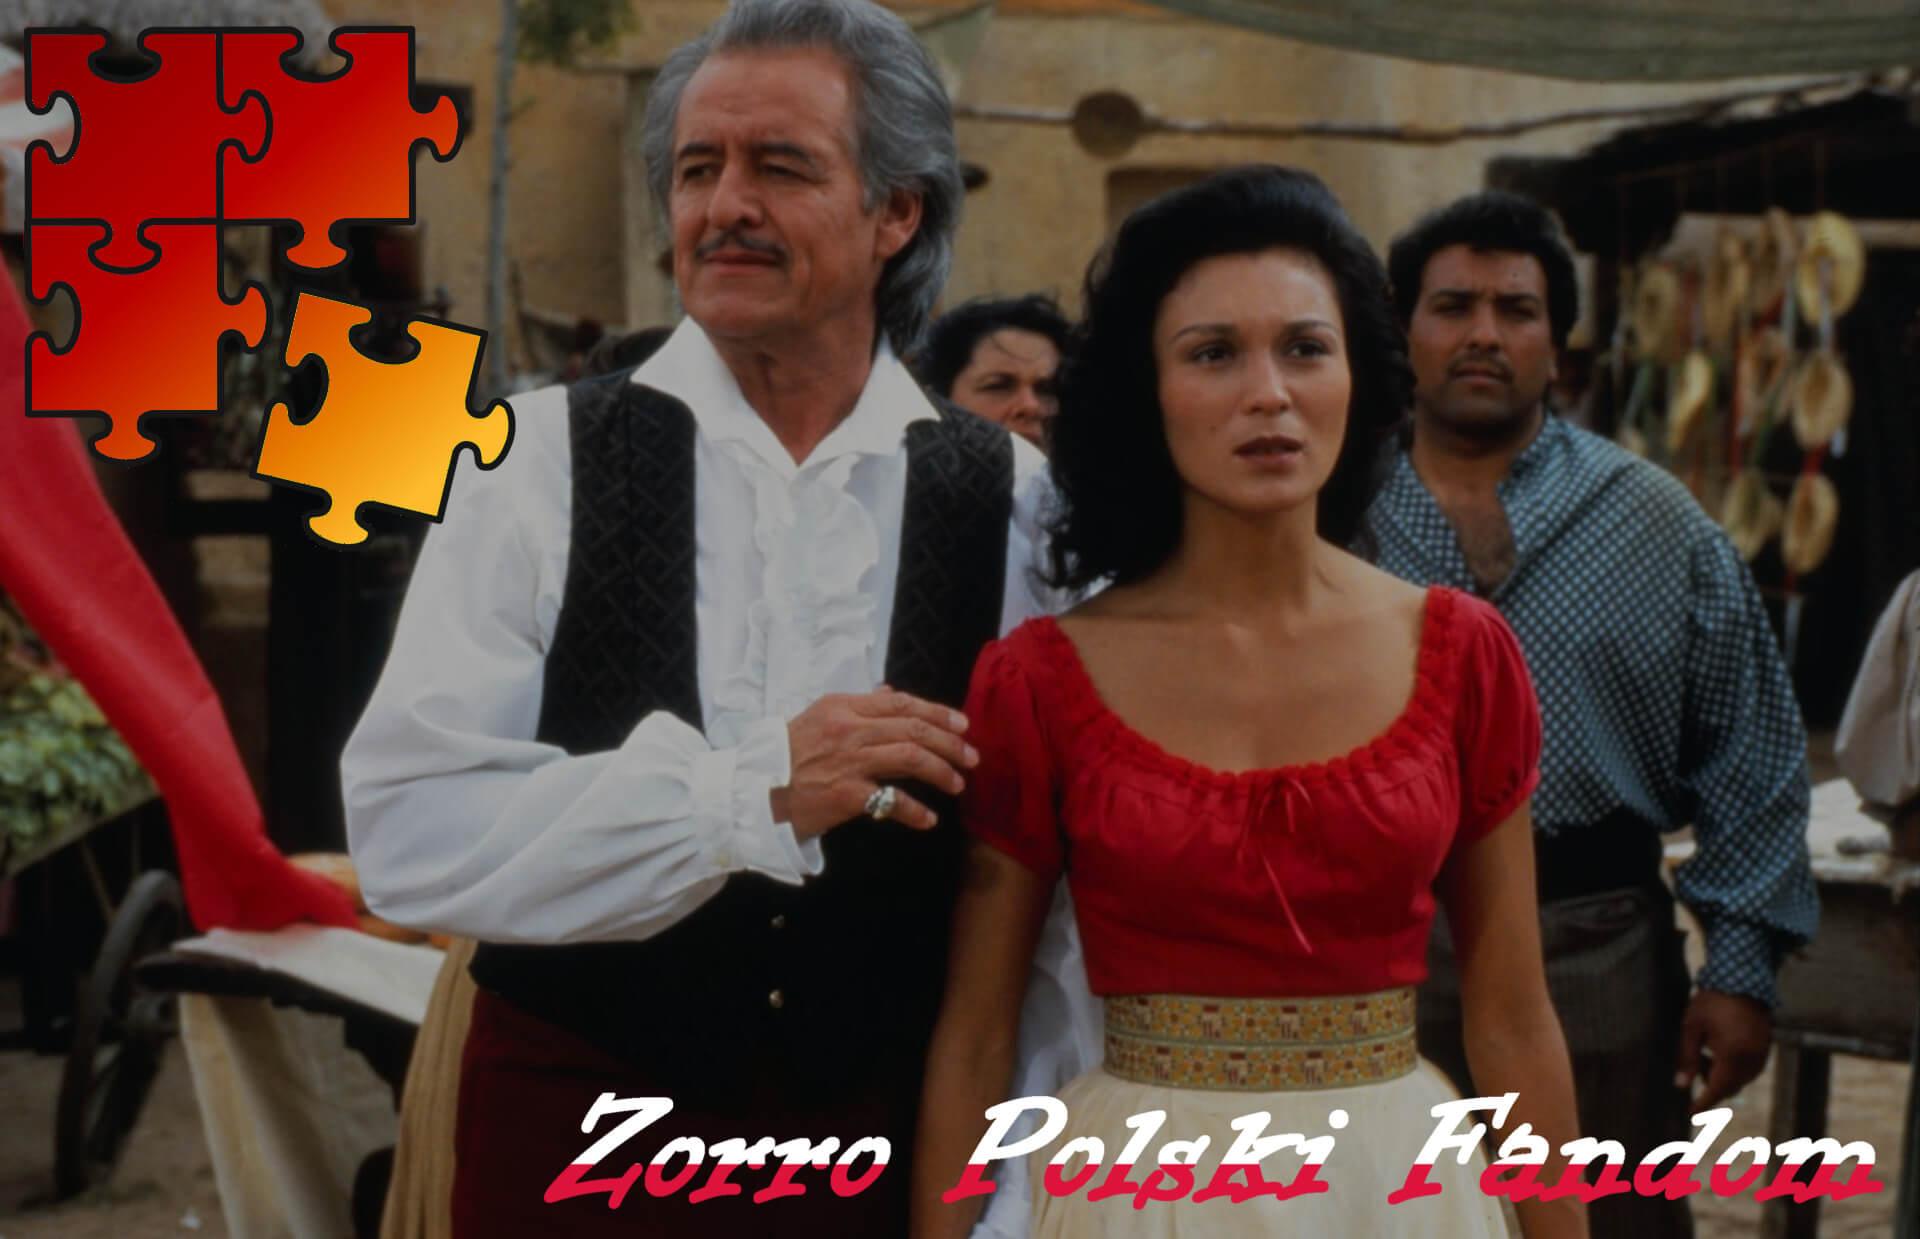 Jigsaw Puzzle Zorro New World Zorro - Alejandro i Victoria PL